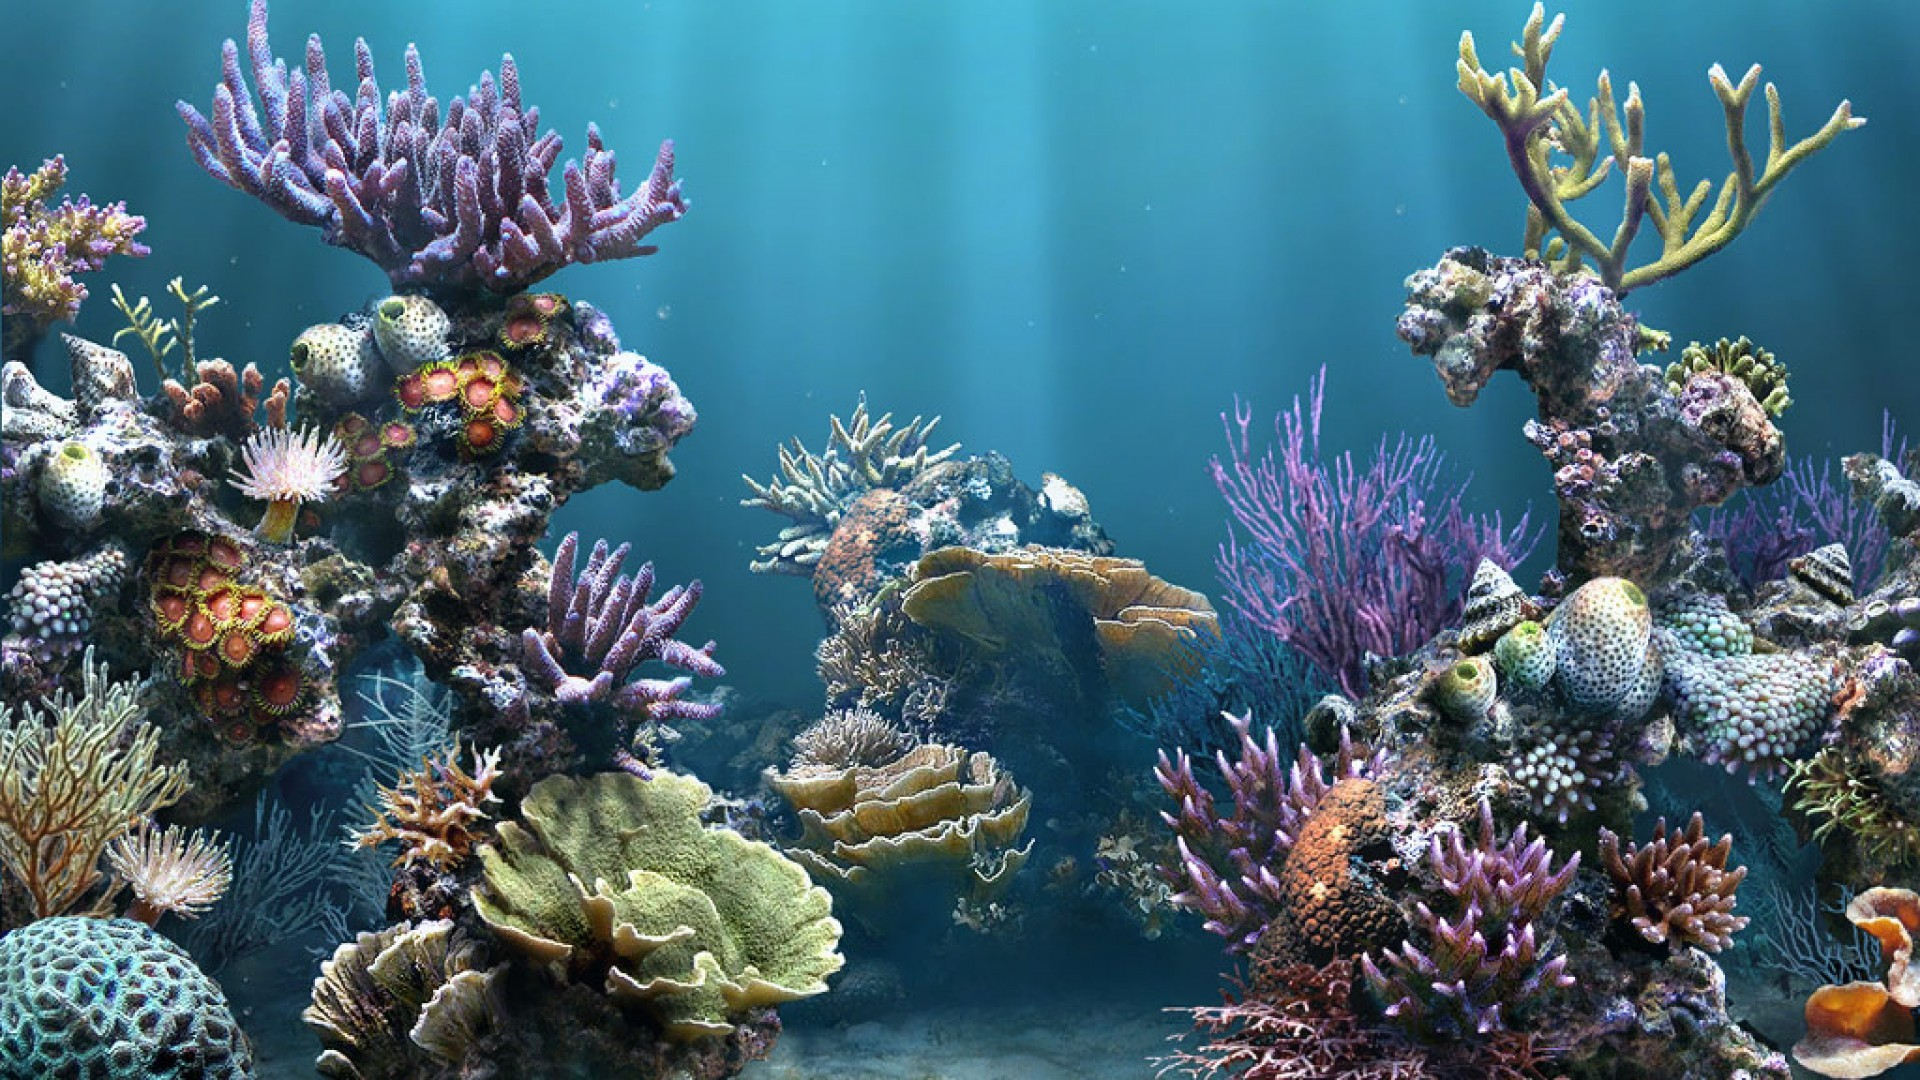 Aquarium Backgrounds Pictures Wallpaper 1920×1080 Aquarium Wallpaper (24  Wallpapers) | Adorable Wallpapers